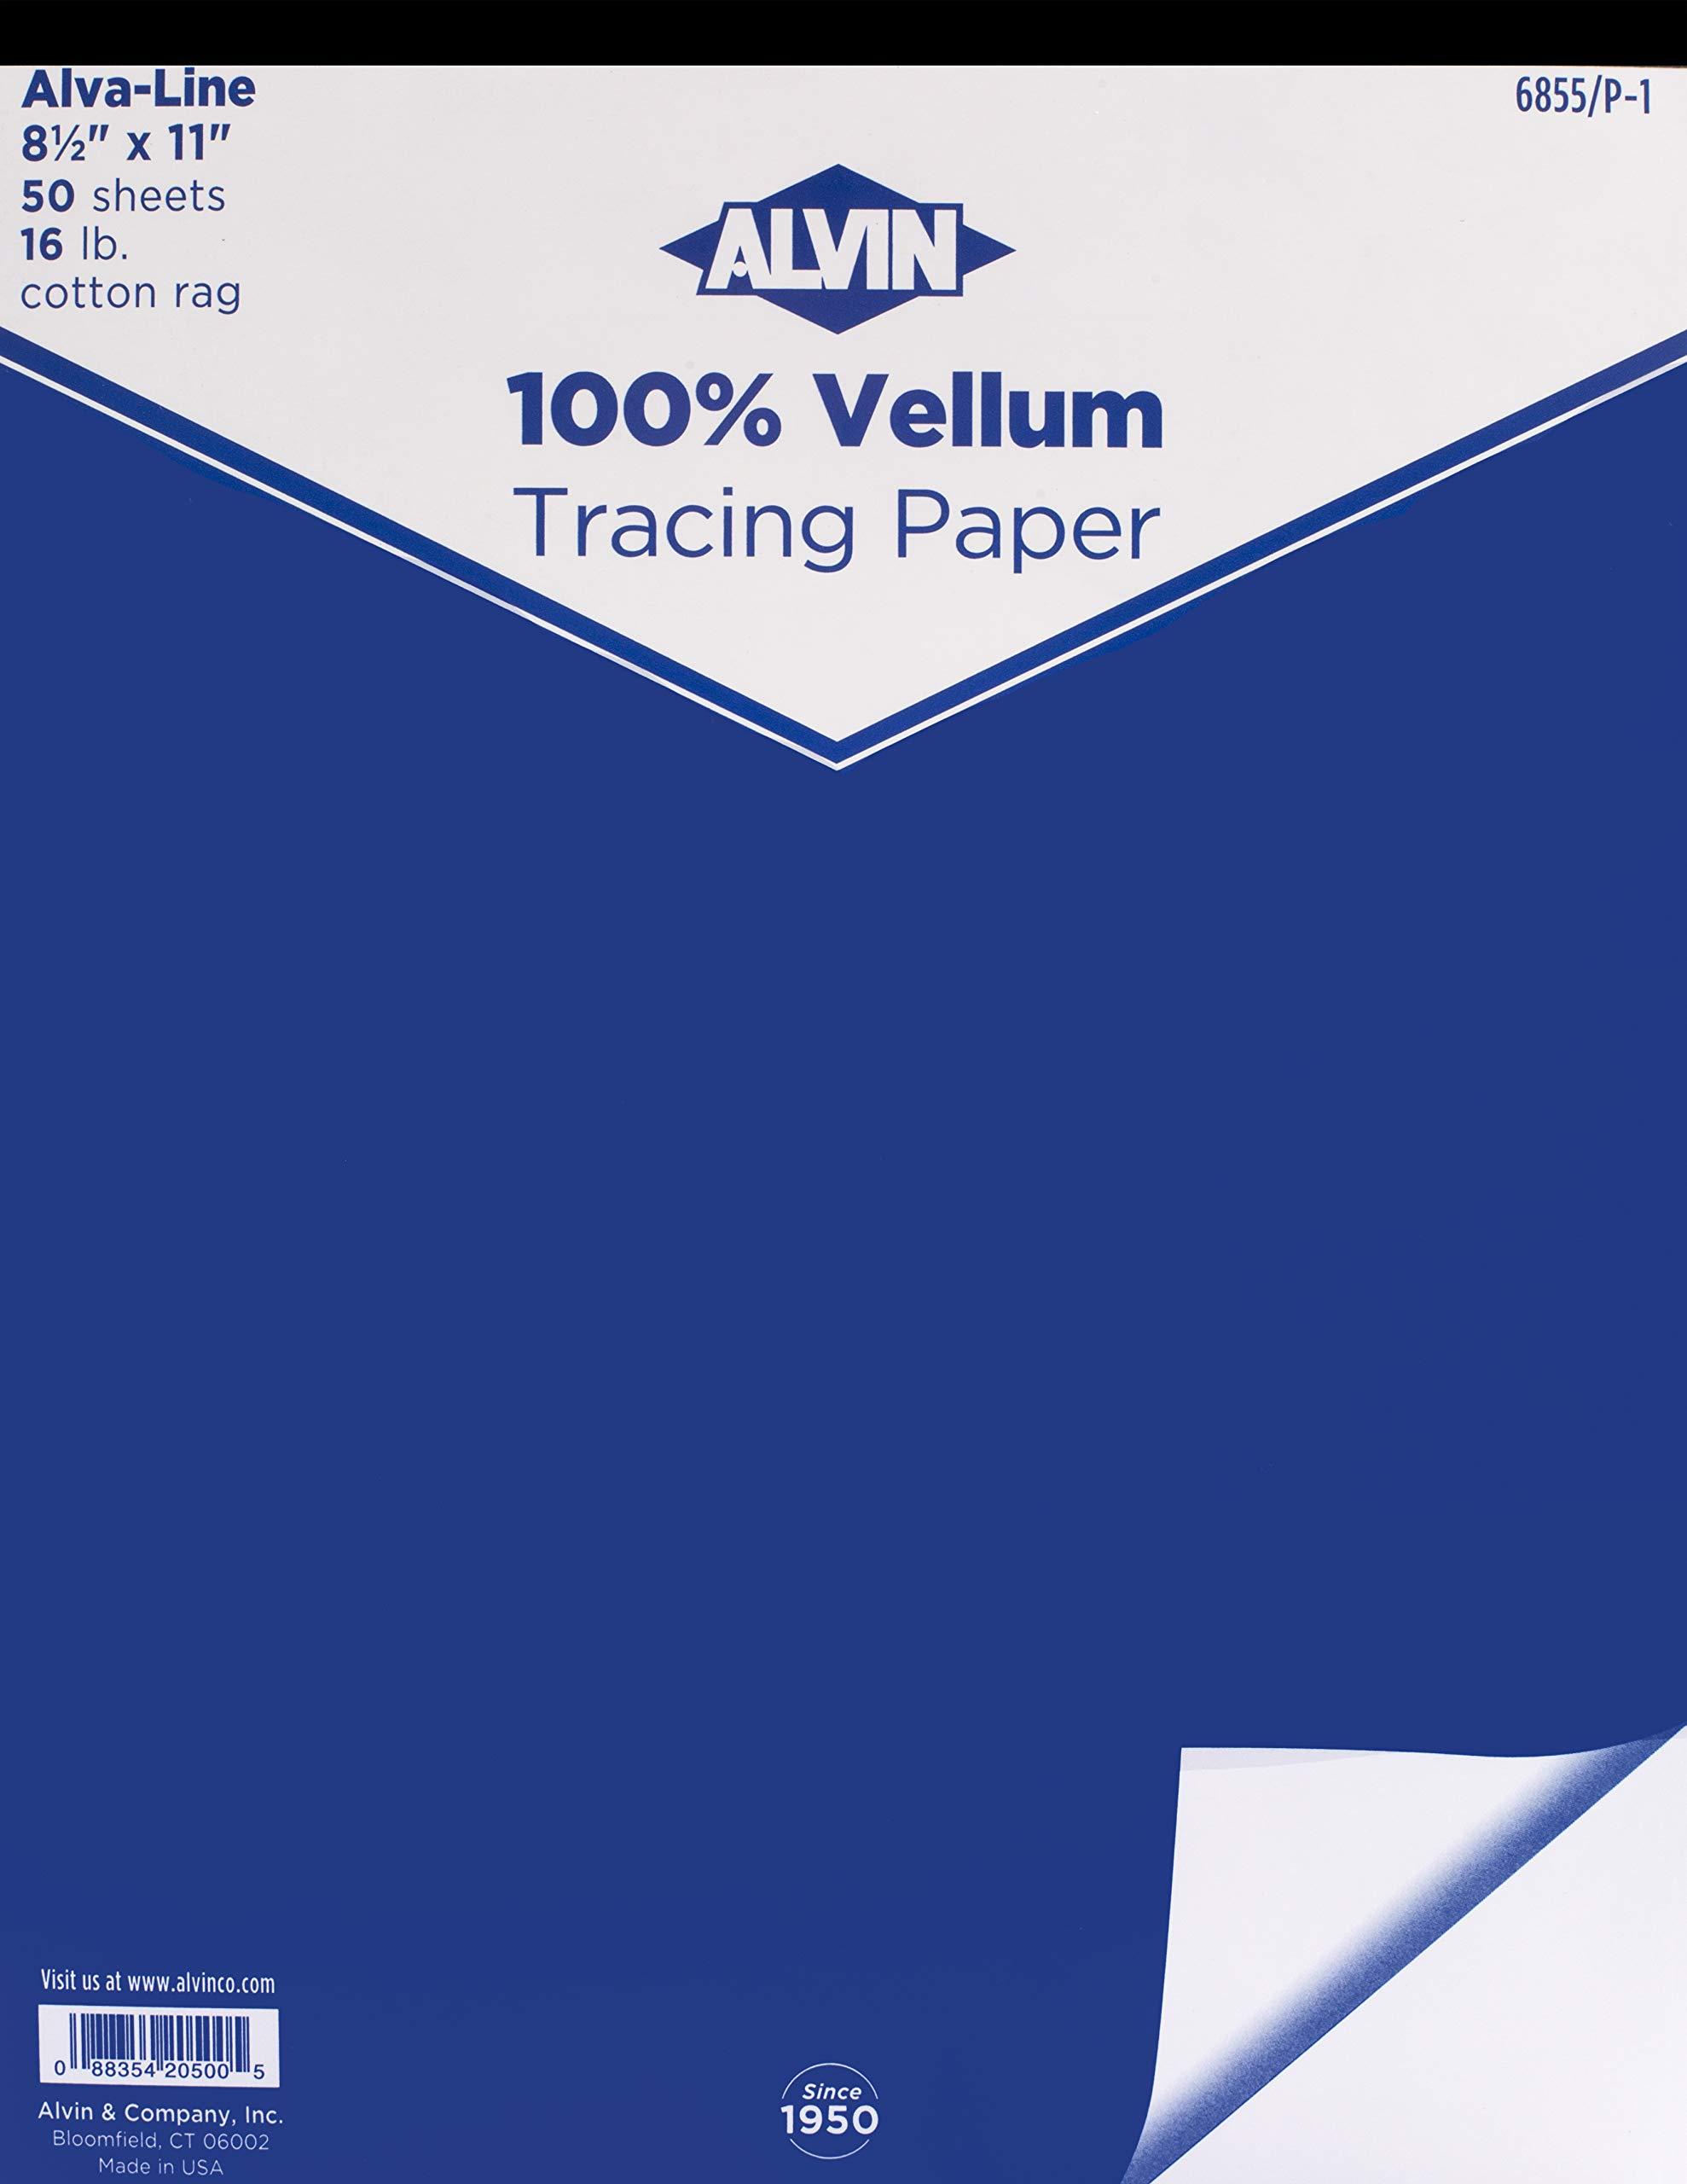 Alvin 6855/P-1 Alva-Line 100 percent Rag Tracing Paper 50-Sheet Pad 8 1/2 inches x 11 inches by Alvin